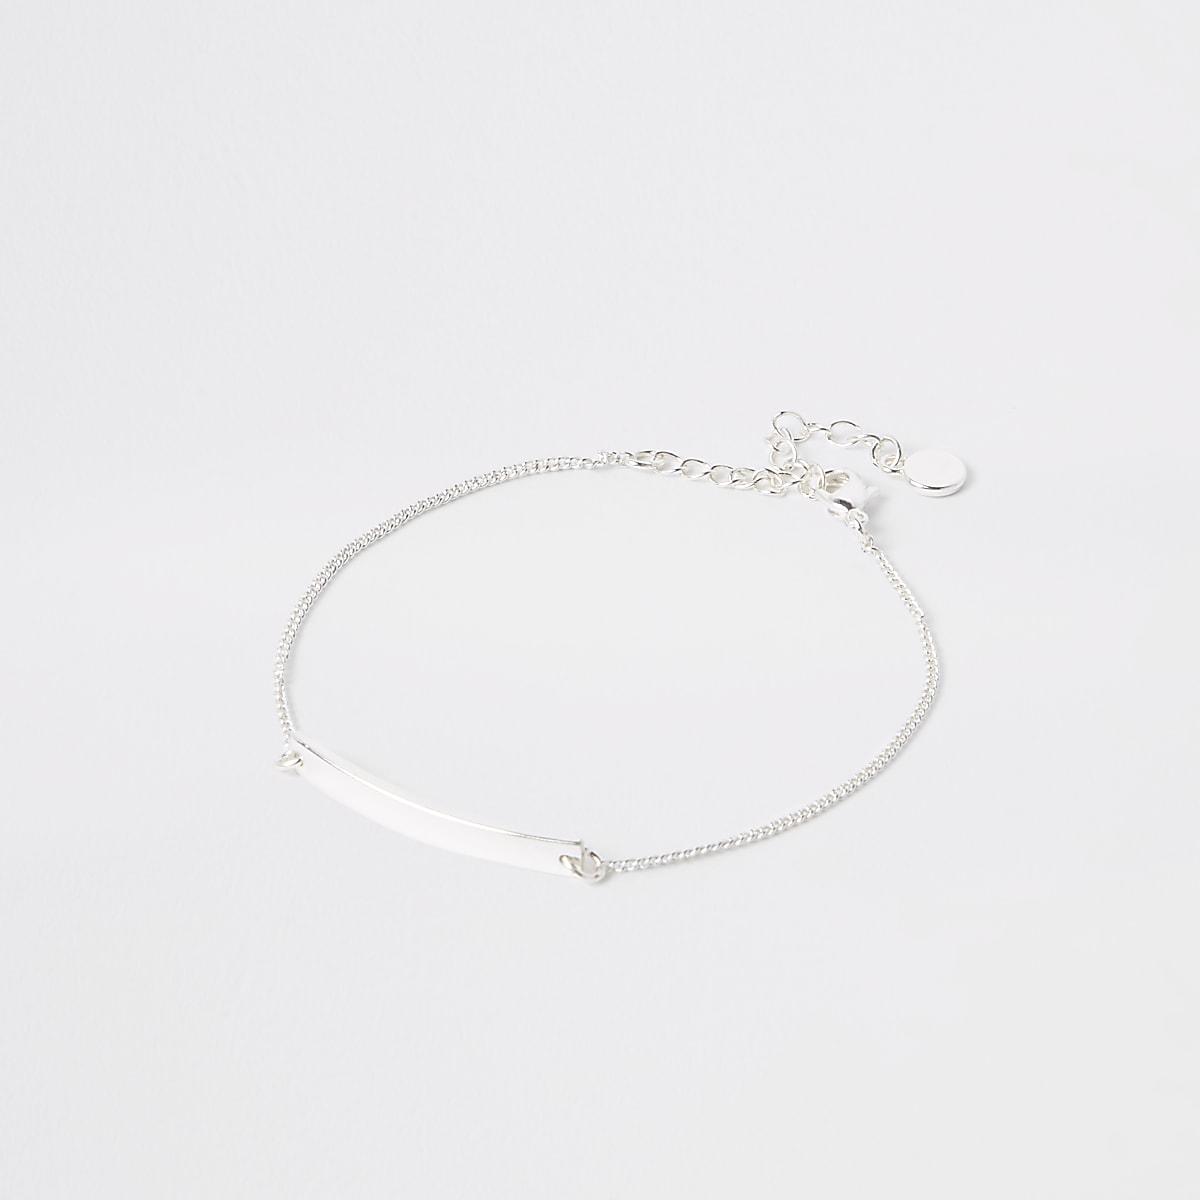 Silver plated bar bracelet